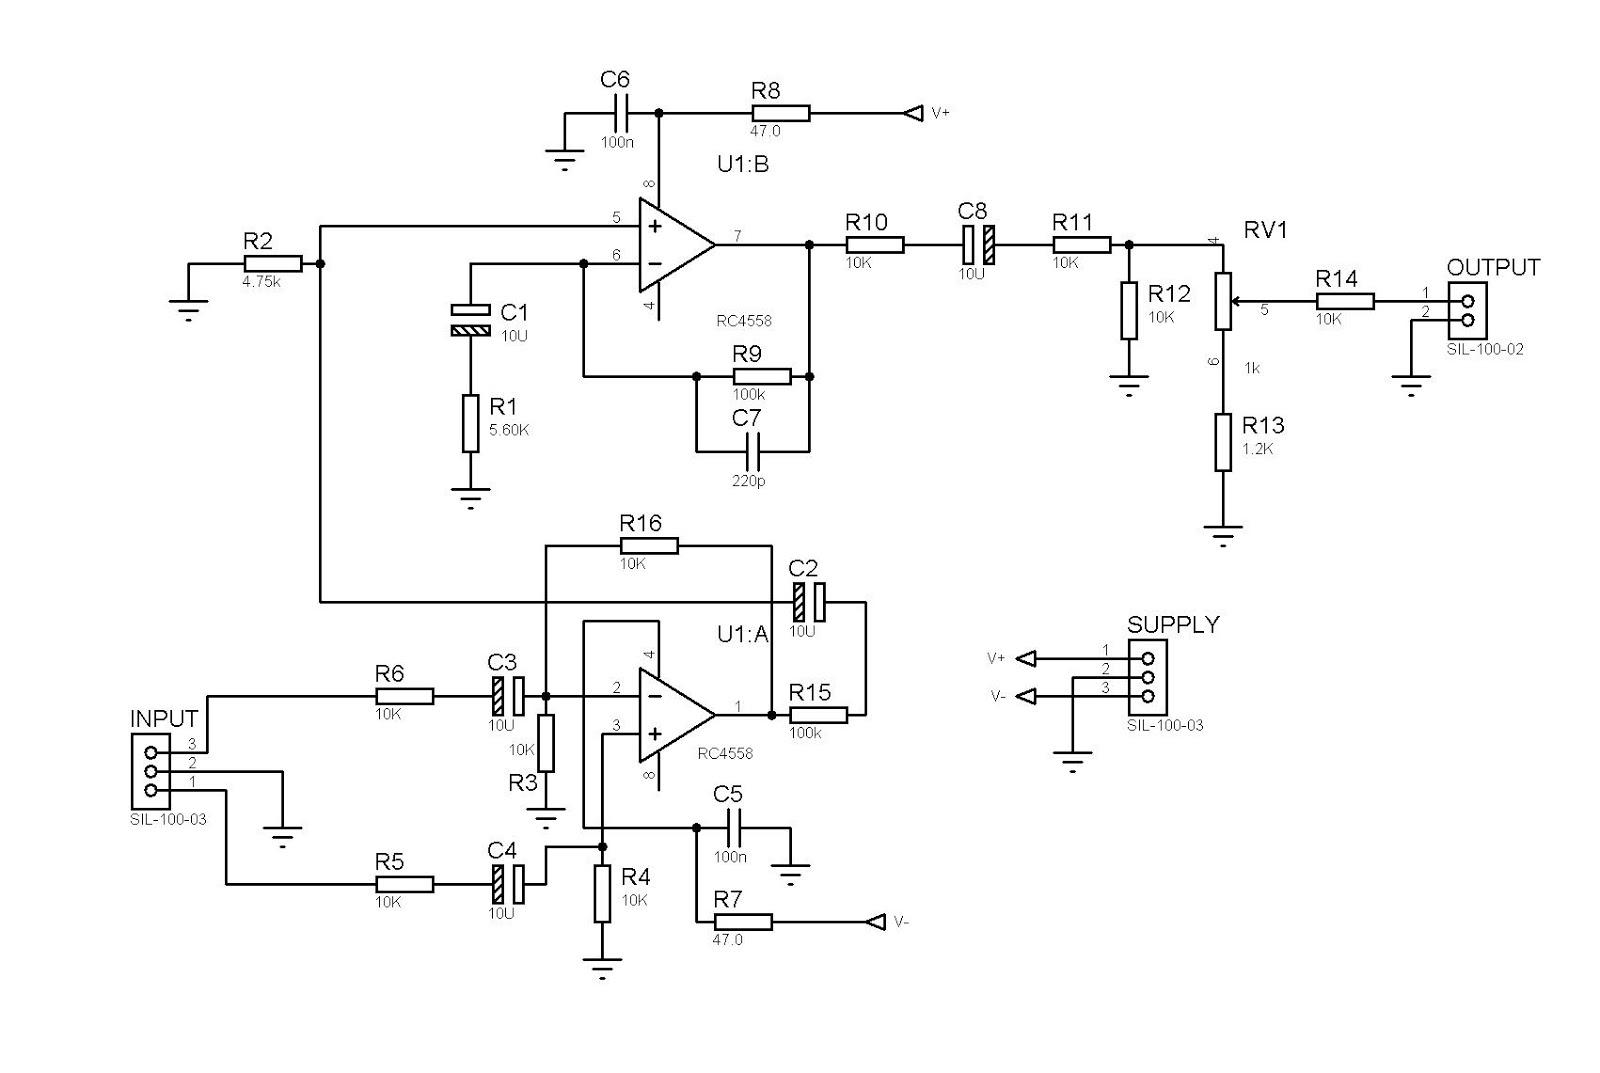 Tda2040 Power Amplifier Circuit Circuits T And Transistors Bd908 Bd907 18w Hifi Audio Xtronic Input Balance 4558